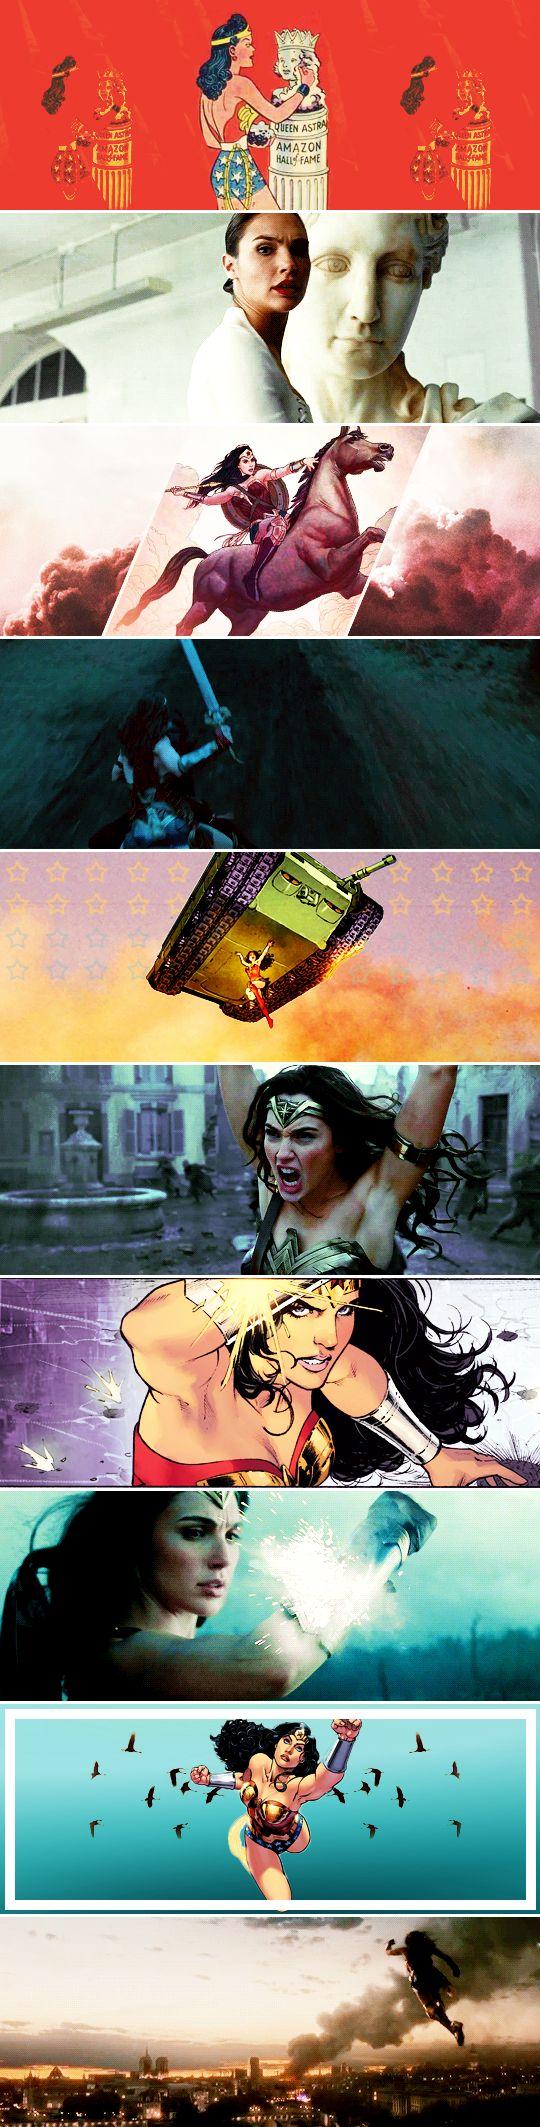 DC Comics Wonder Woman (2017) #Wonder_Woman #Comics #Comic_Books